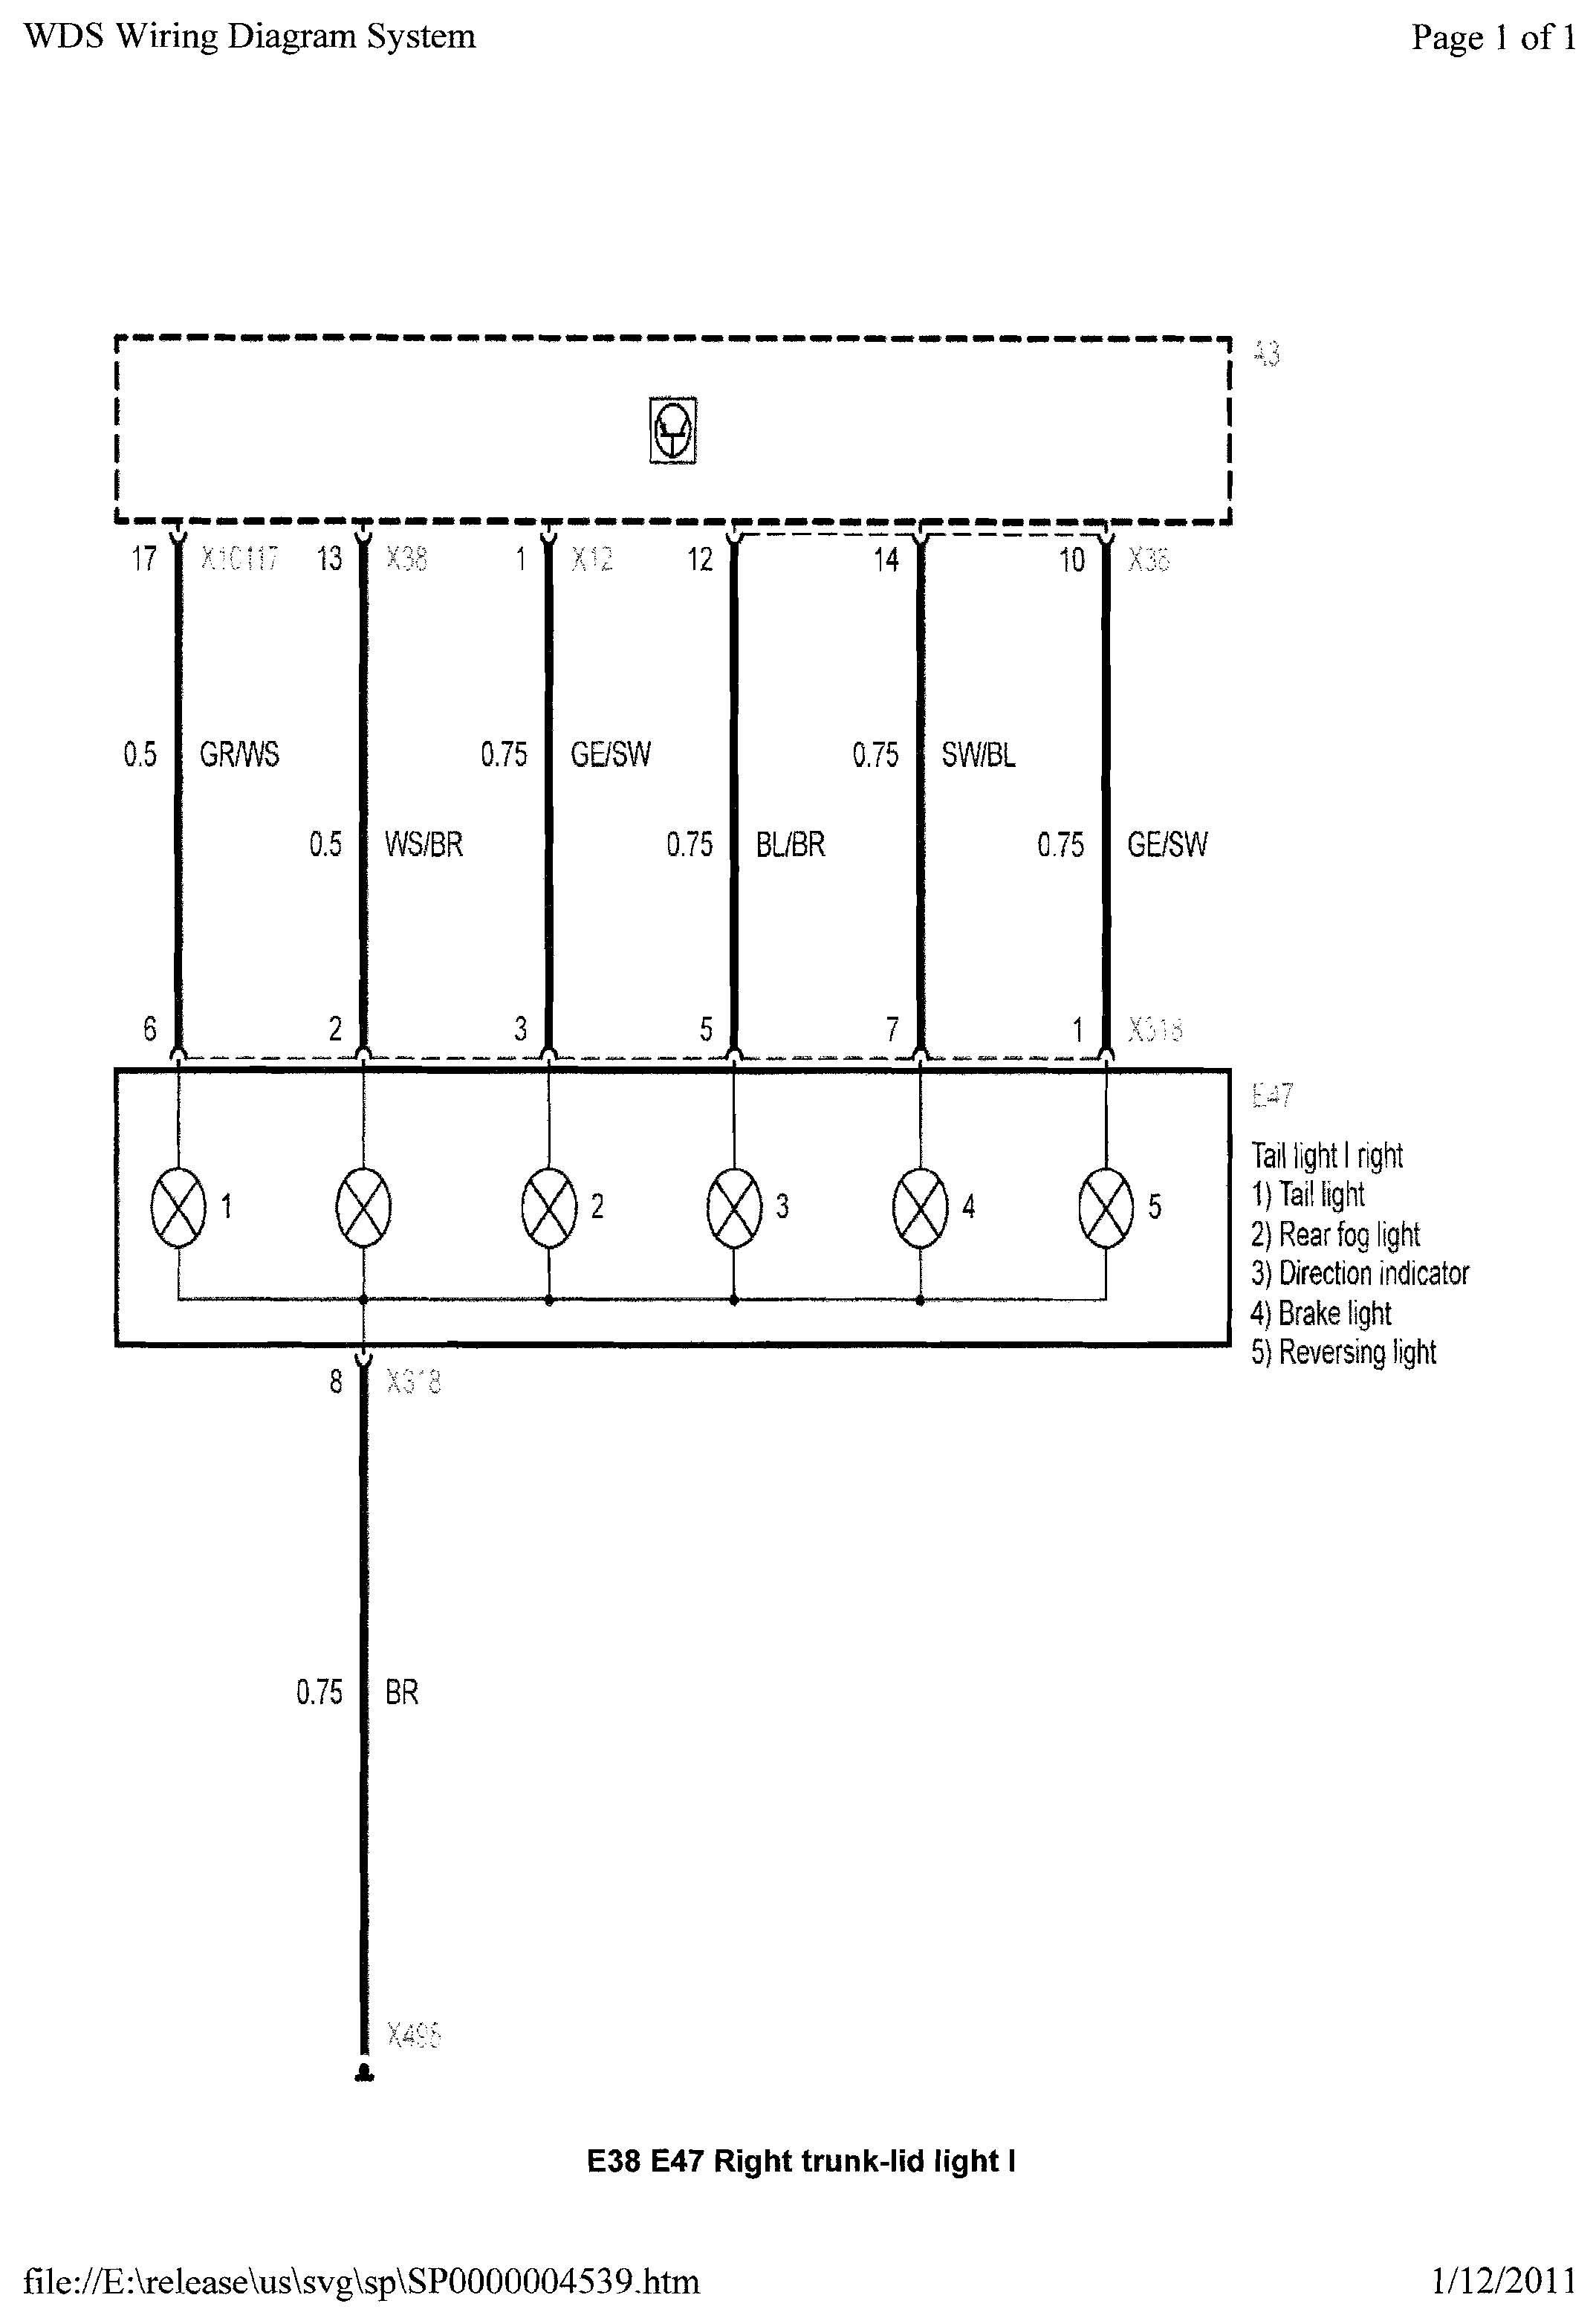 e46 brake light wiring diagram e tail light wiring diagram e image – Dinli Wiring Schematic